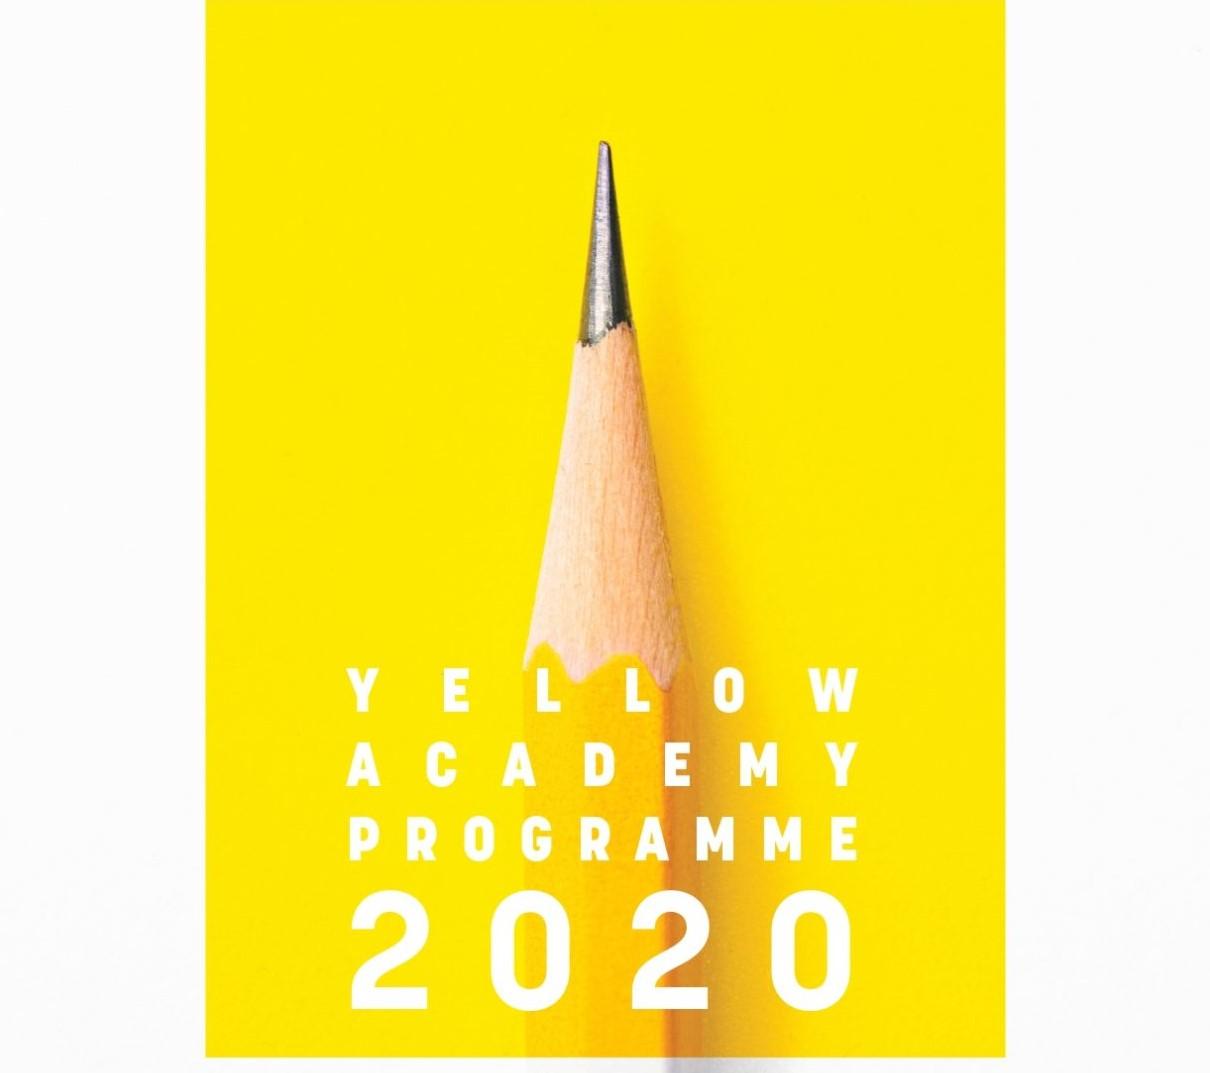 Euractiv invites logos for the yellow academy